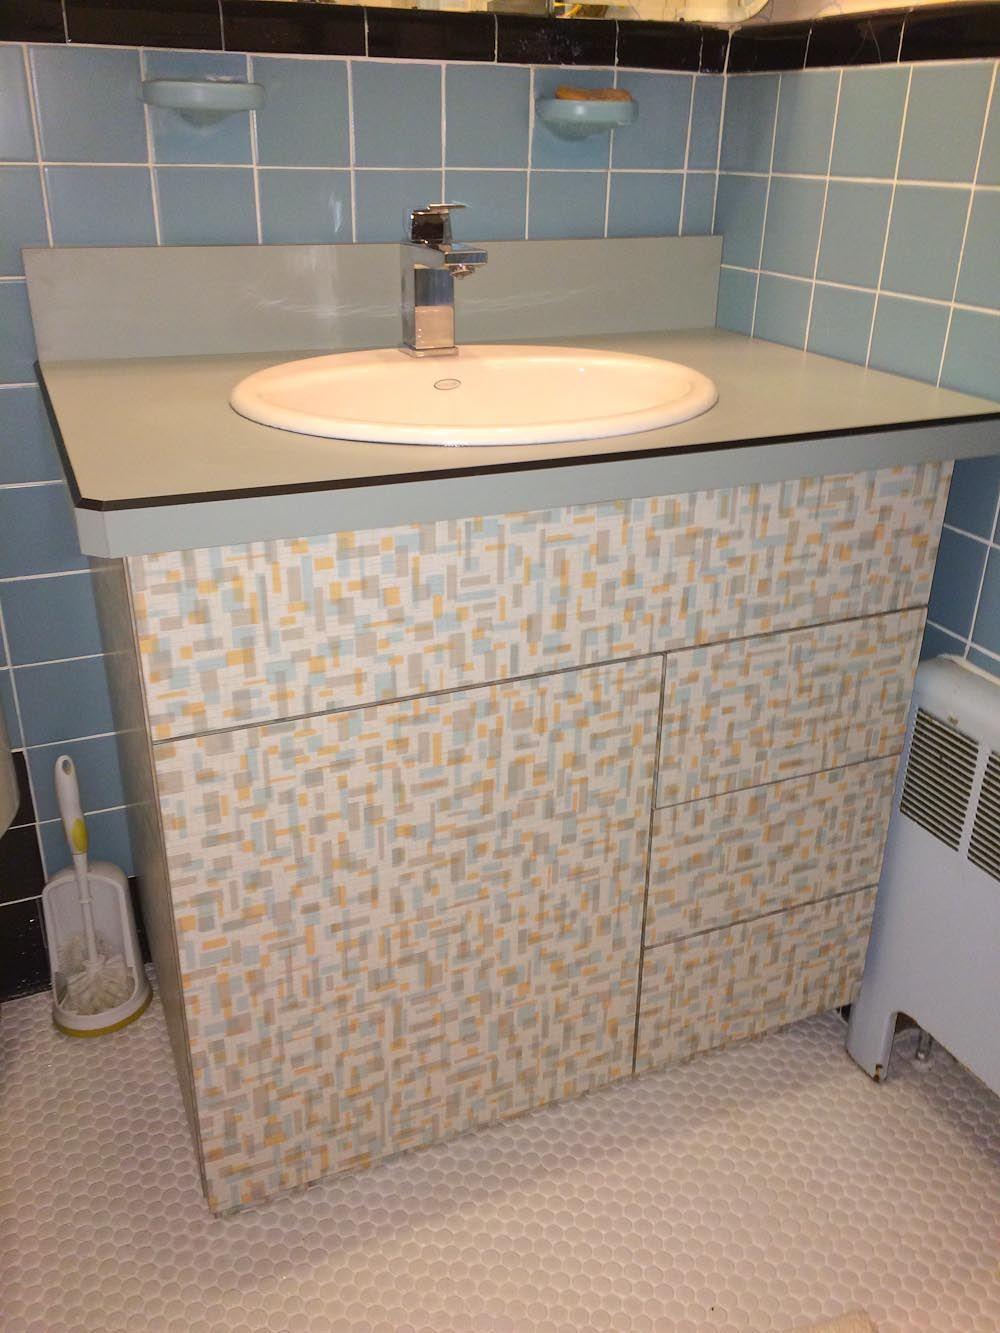 rooms modern hgtv design pictures from midcentury ideas vanity bathrooms bathroom mid century